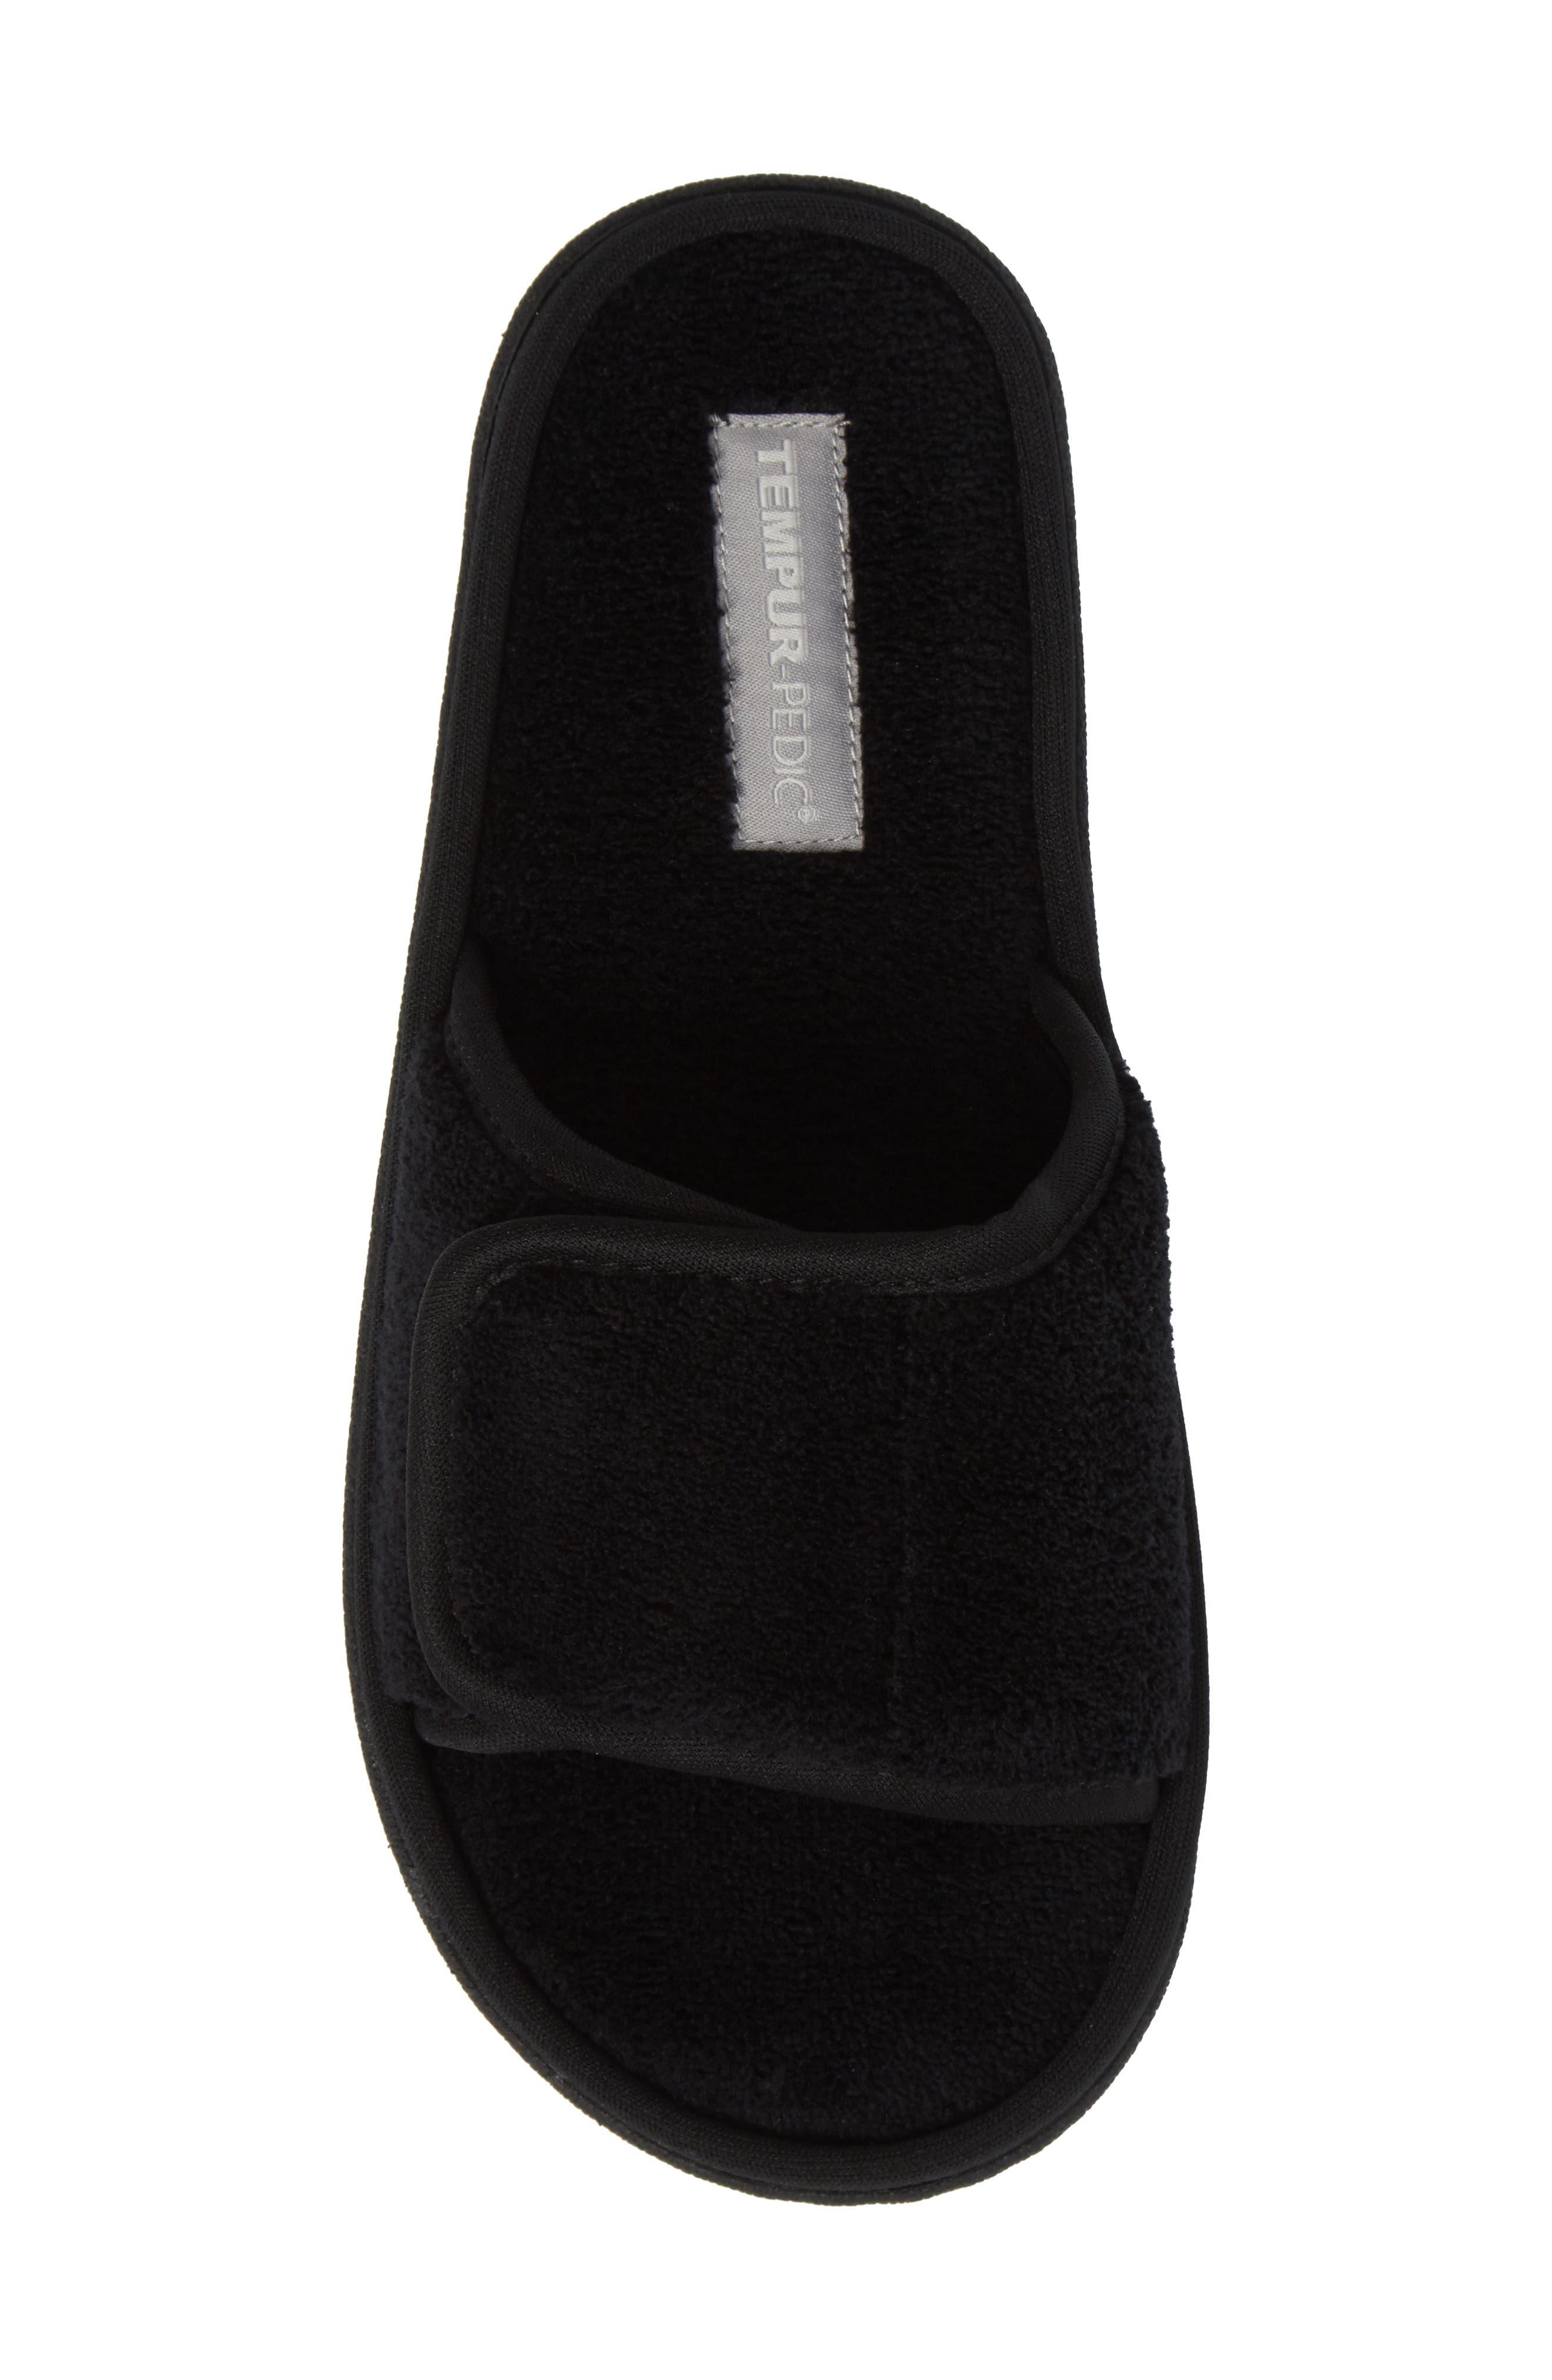 Geana Slipper,                             Alternate thumbnail 5, color,                             Black Fabric